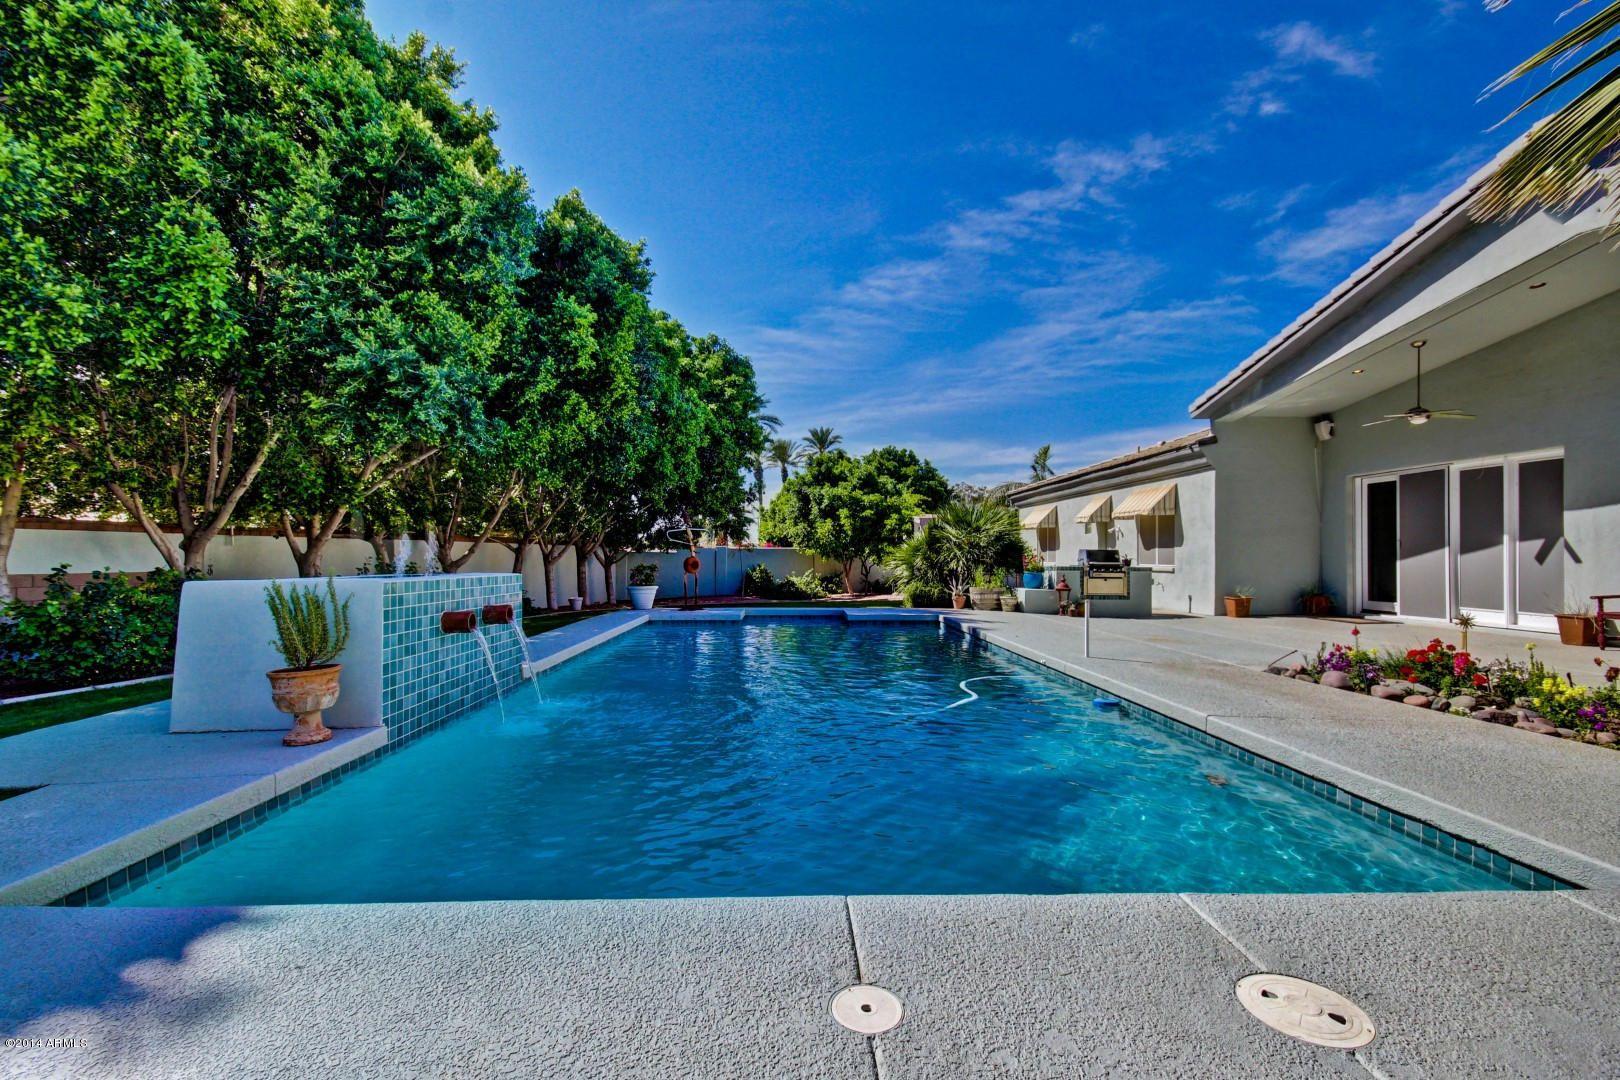 az pools arcadia az home for sale with pool outdoors